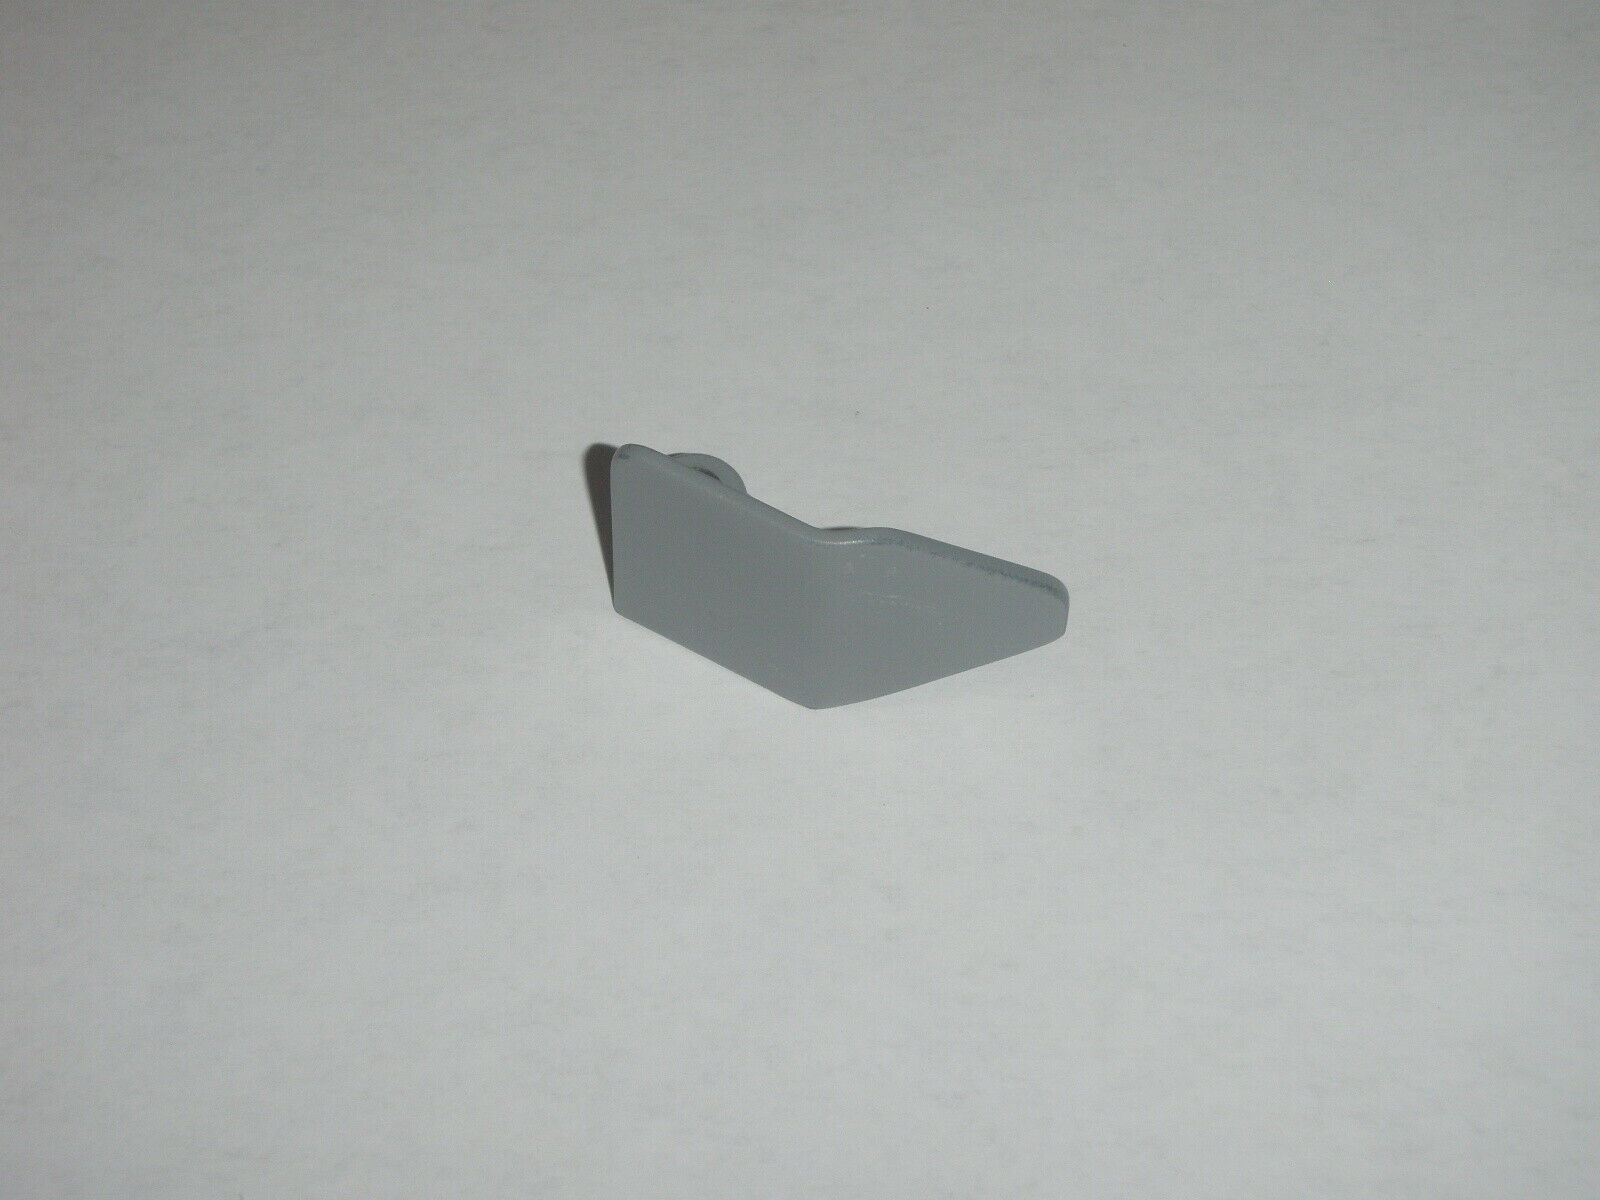 Breadman Bread Maker Machine OEM Kneading Blade Paddle for models TR777 TR2200 image 6